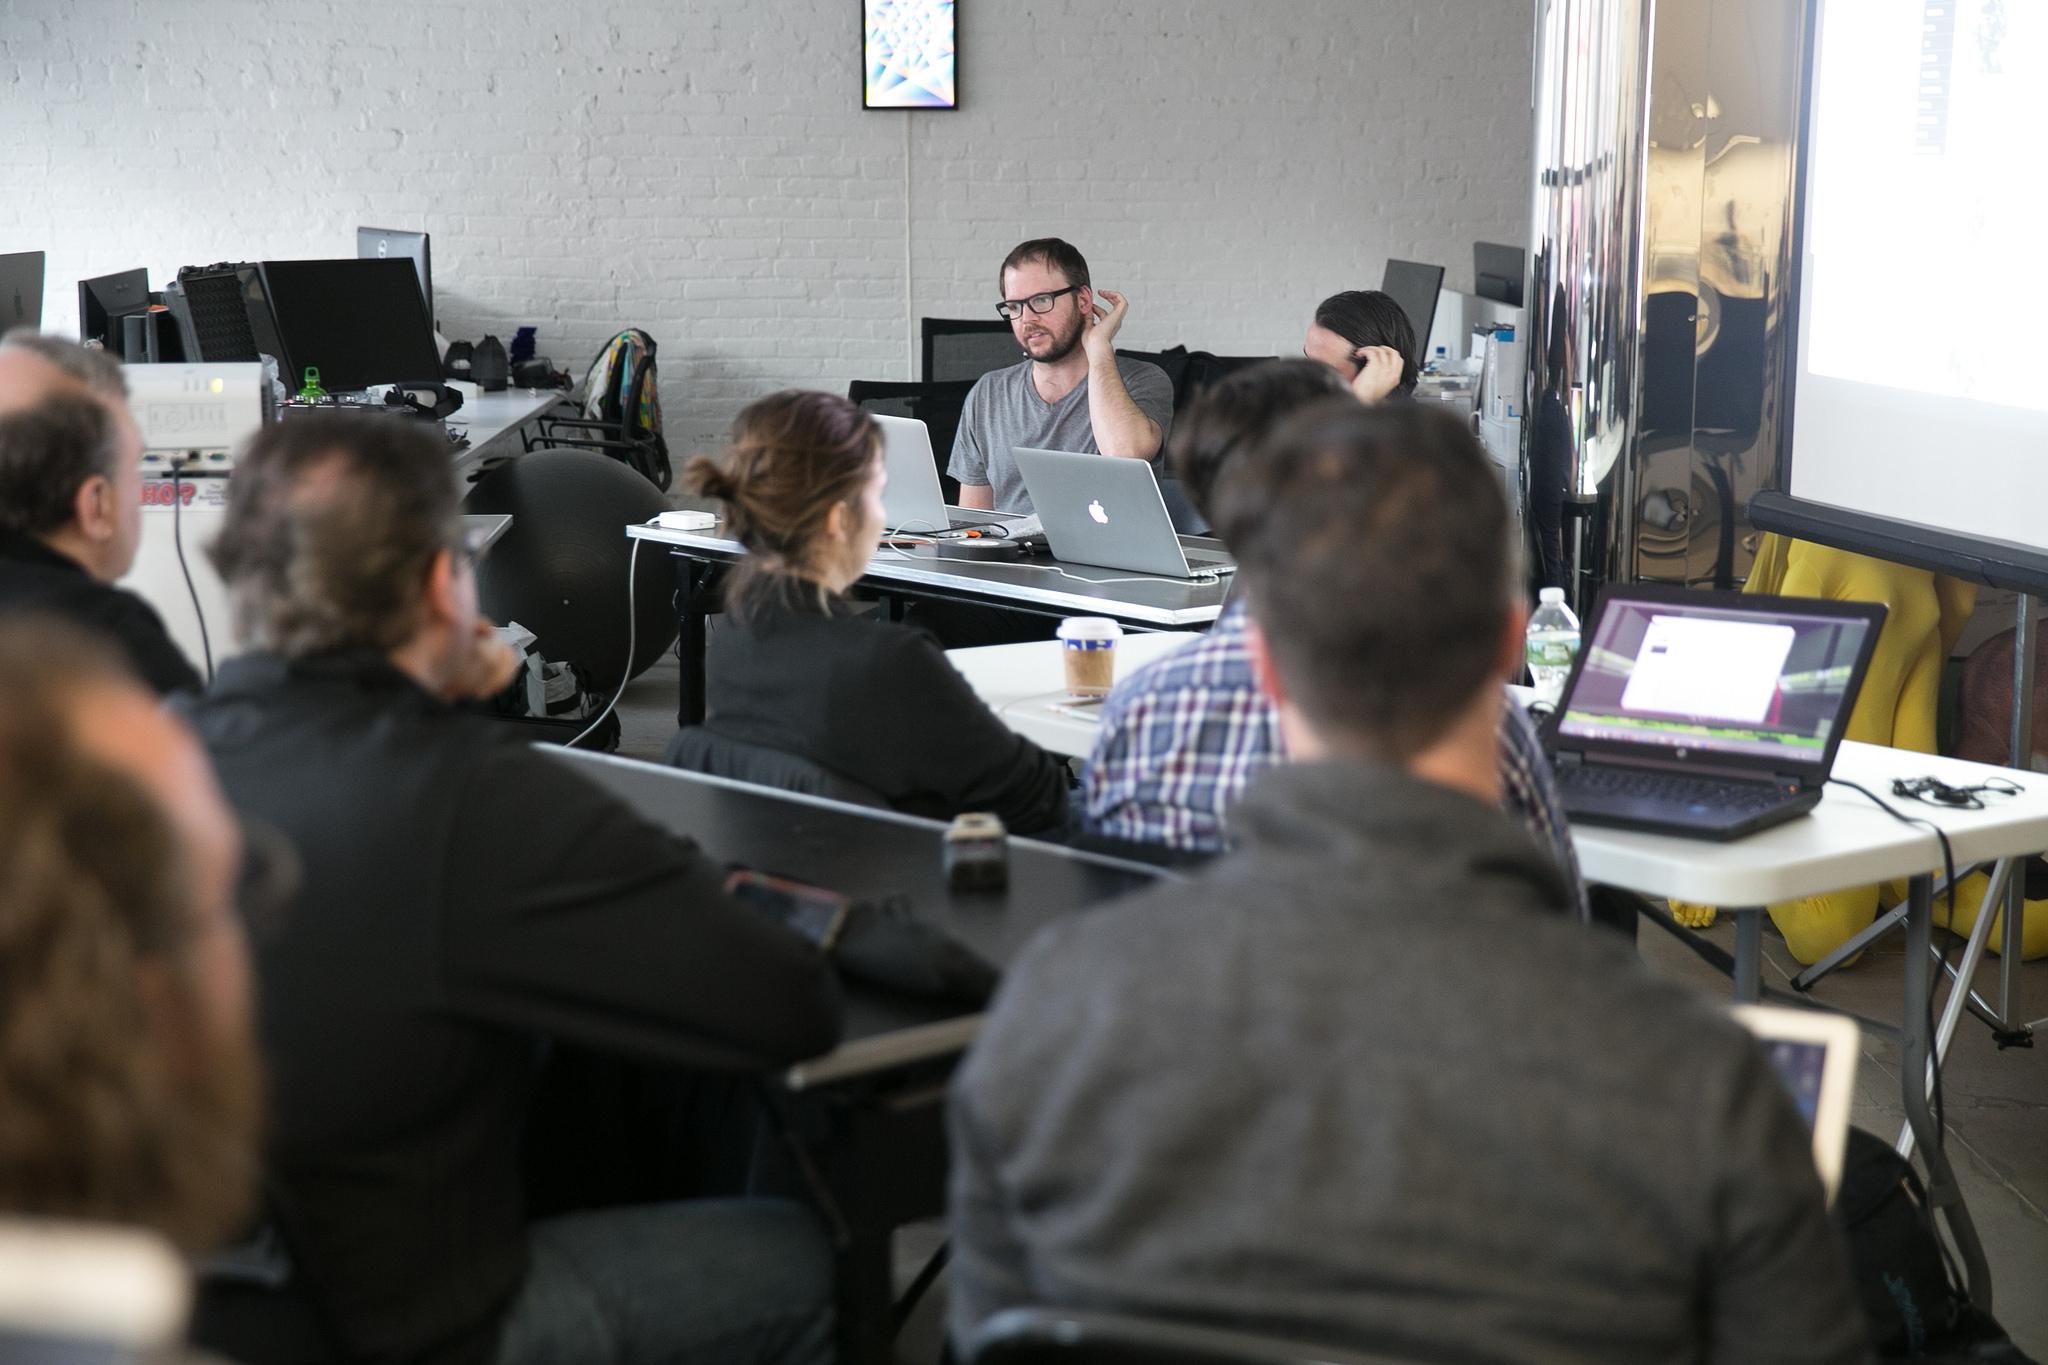 Sensorium Works: Live Action VR Workshop with Matthew Niederhauser and John Fitzgerald